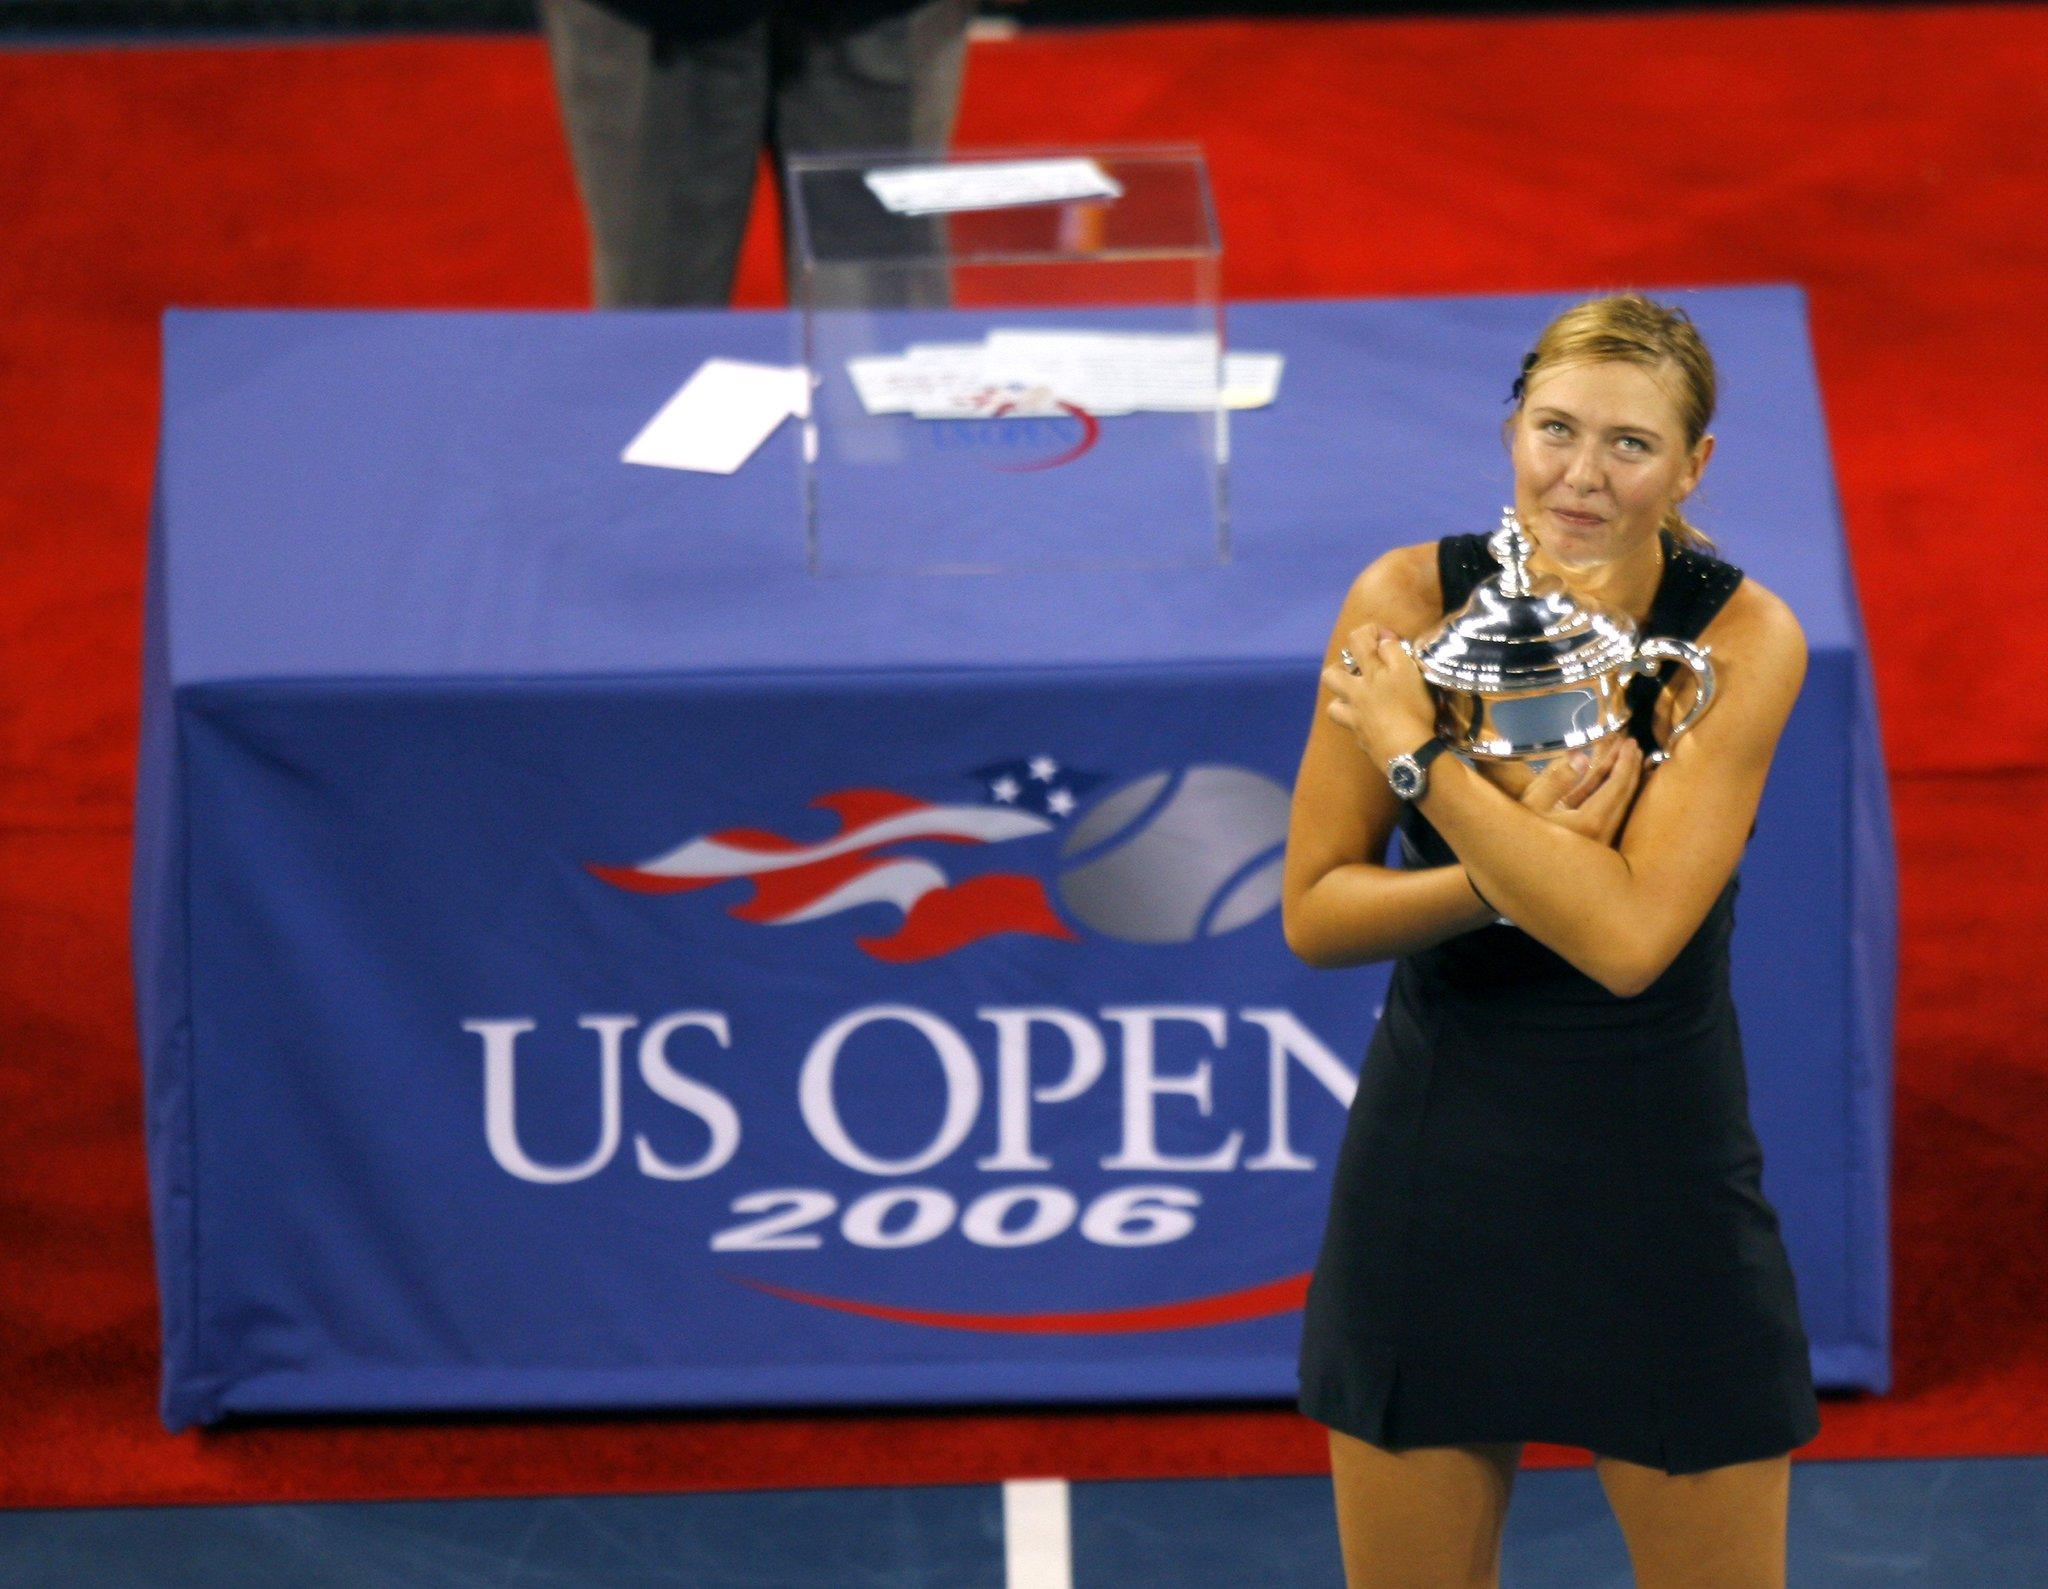 .@USOpen announces wildcard for 2006 champion @MariaSharapova.  Complete List--> https://t.co/SJZDM2FHxA https://t.co/1JeNf0sYdV